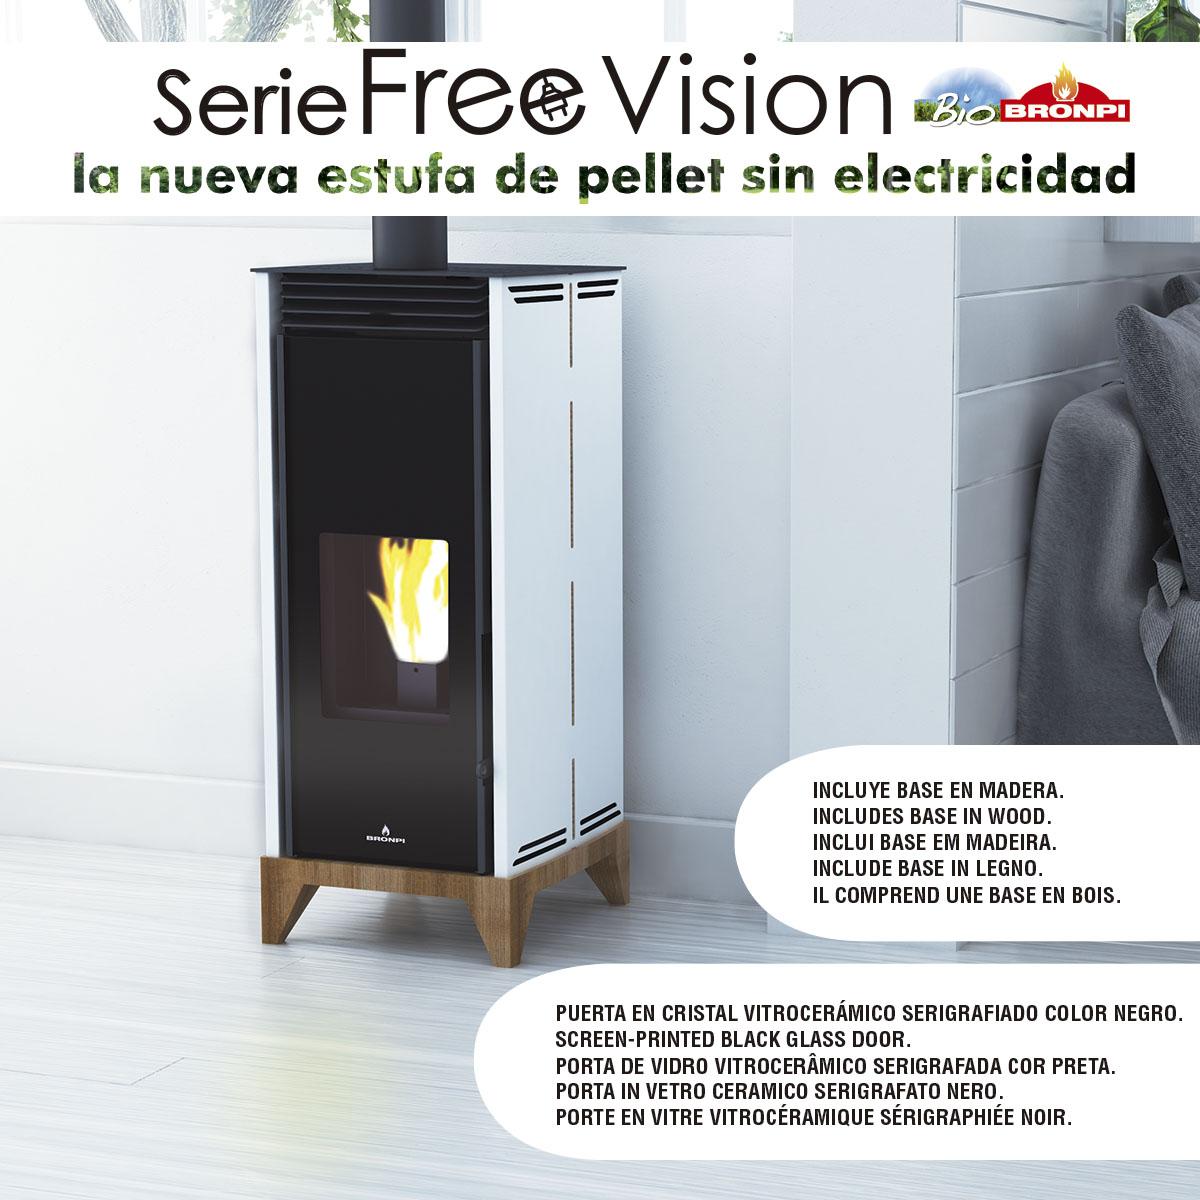 FREE 11 VISION